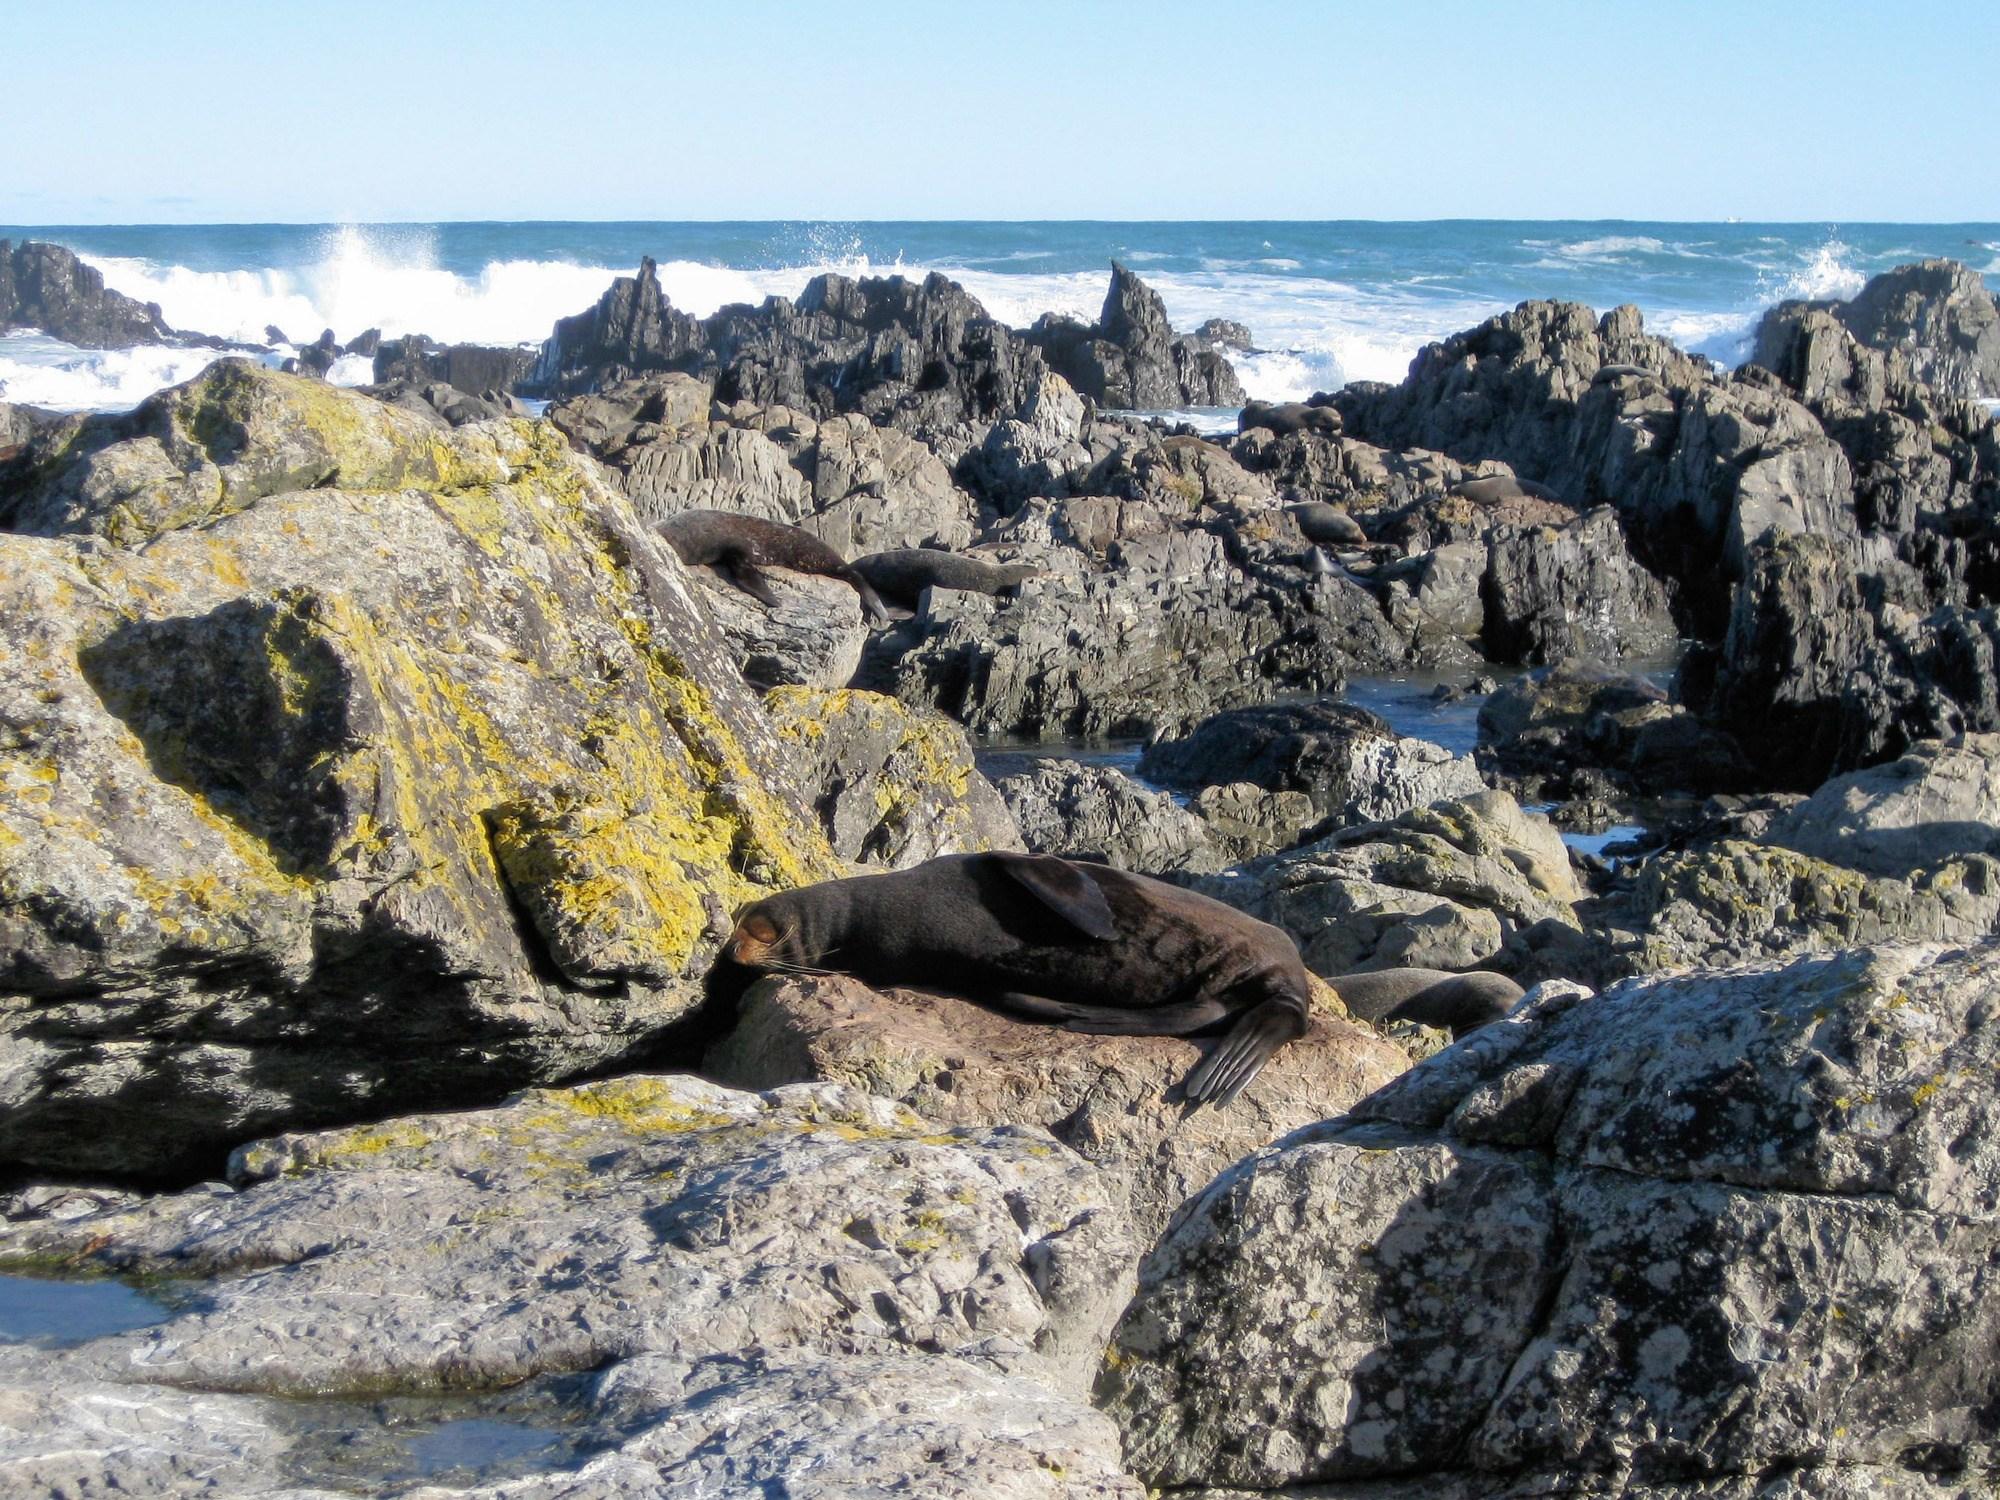 New Zealand fur seals at Sinclair Head in Wellington